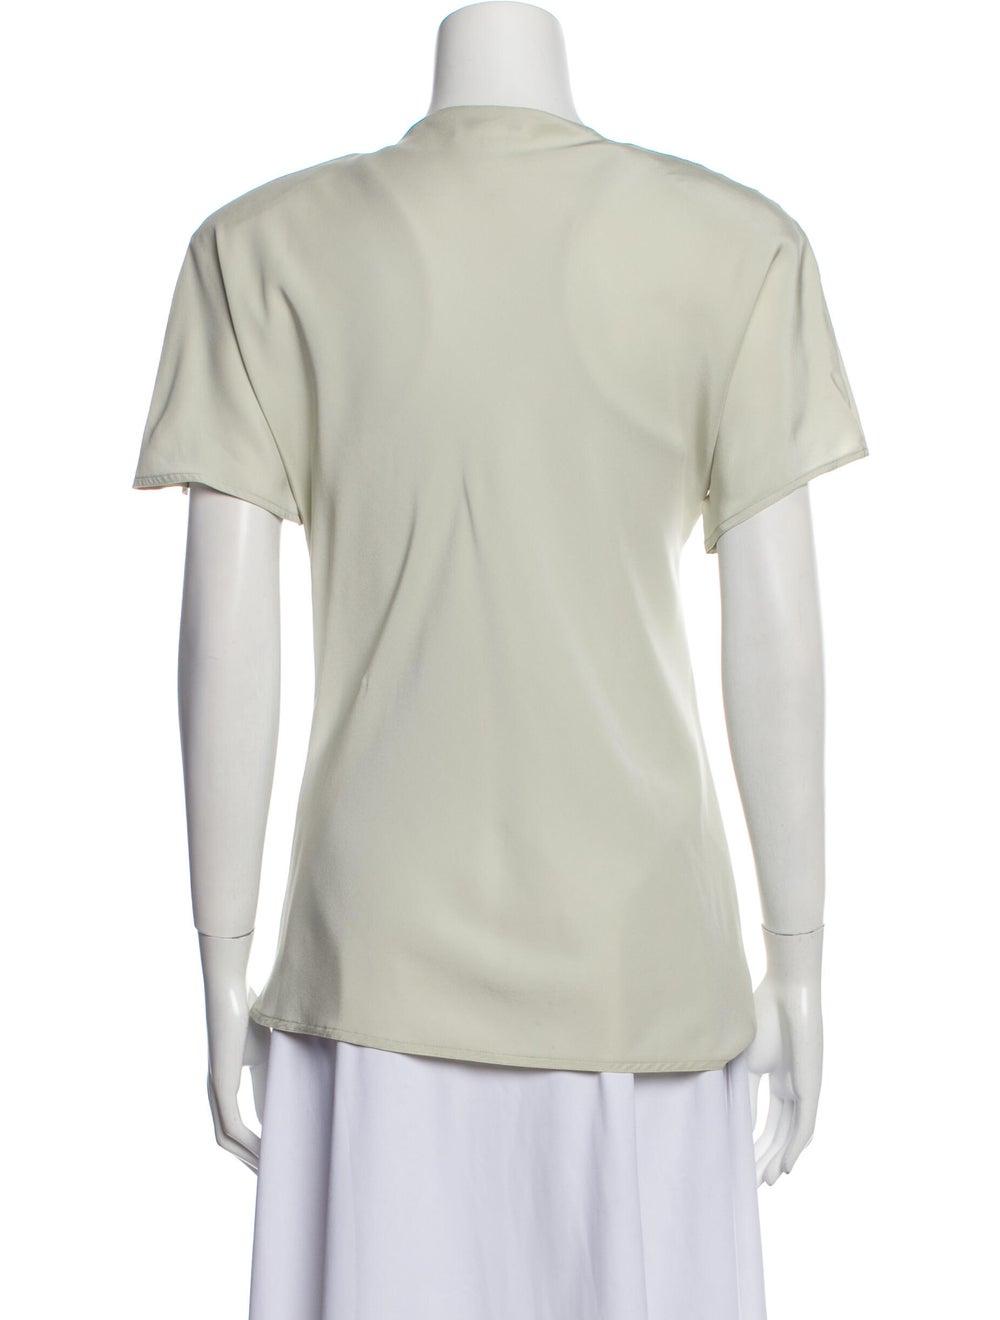 Jackie Rogers Silk V-Neck T-Shirt Green - image 3